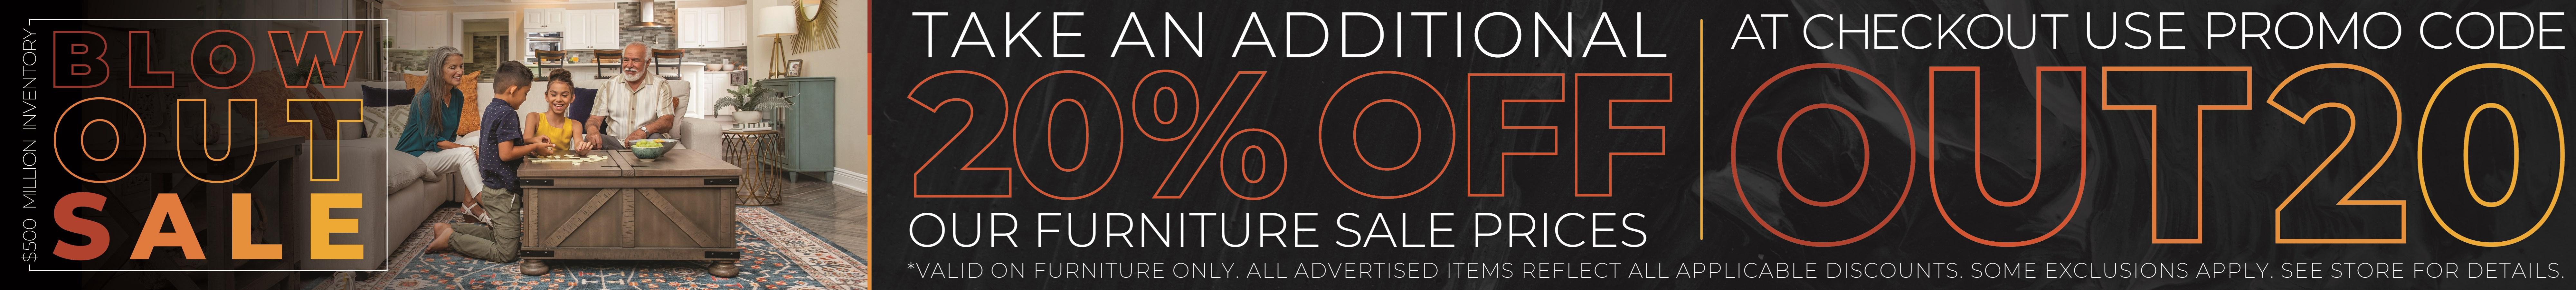 Furniture & ApplianceMart $500M Blowout Sale